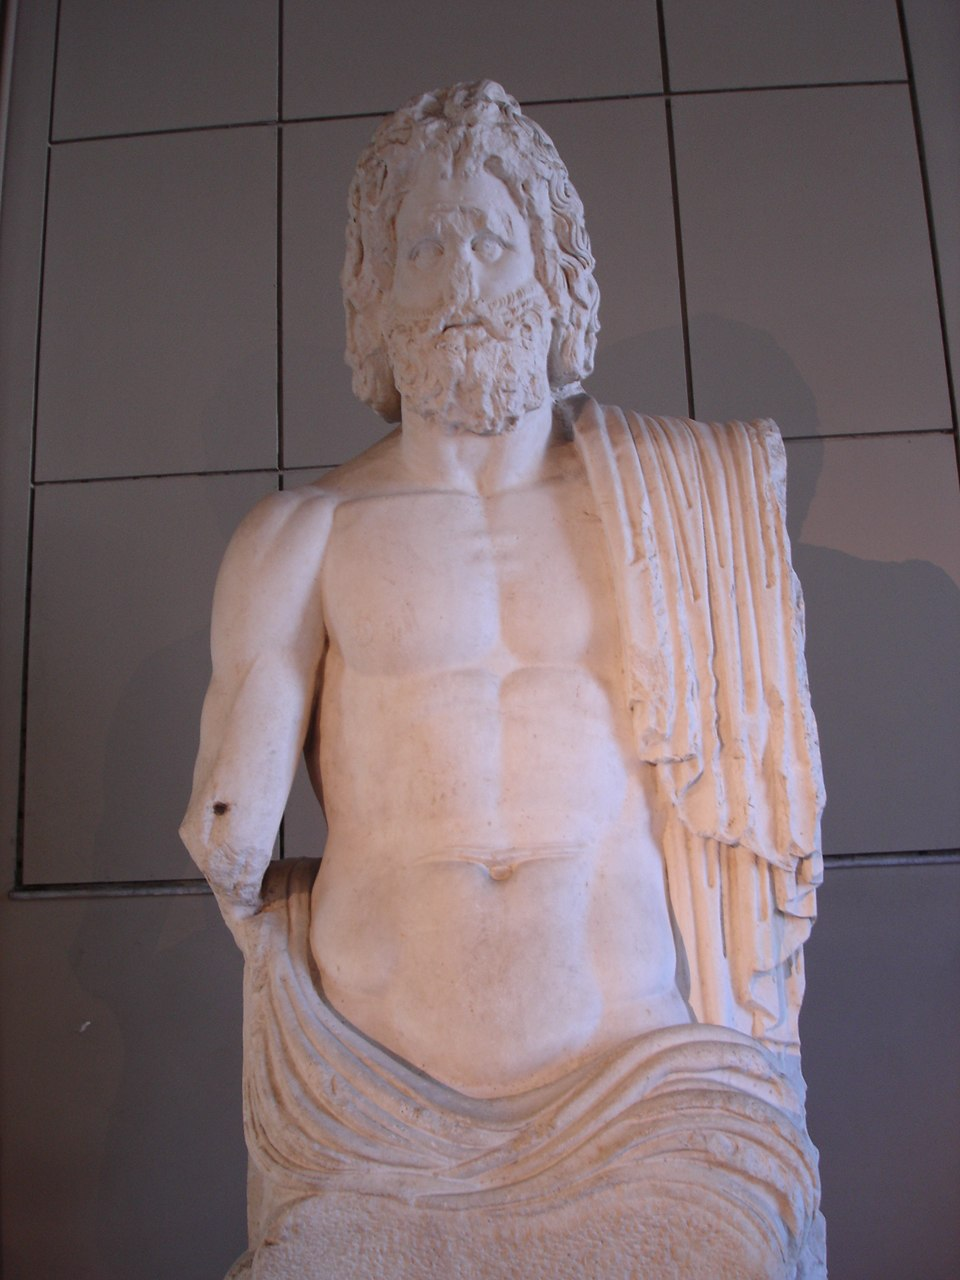 4551 - Istanbul - Museo archeol. - Zeus - sec. II d.C. - da Gaza - Foto G. Dall'Orto 28-5-2006